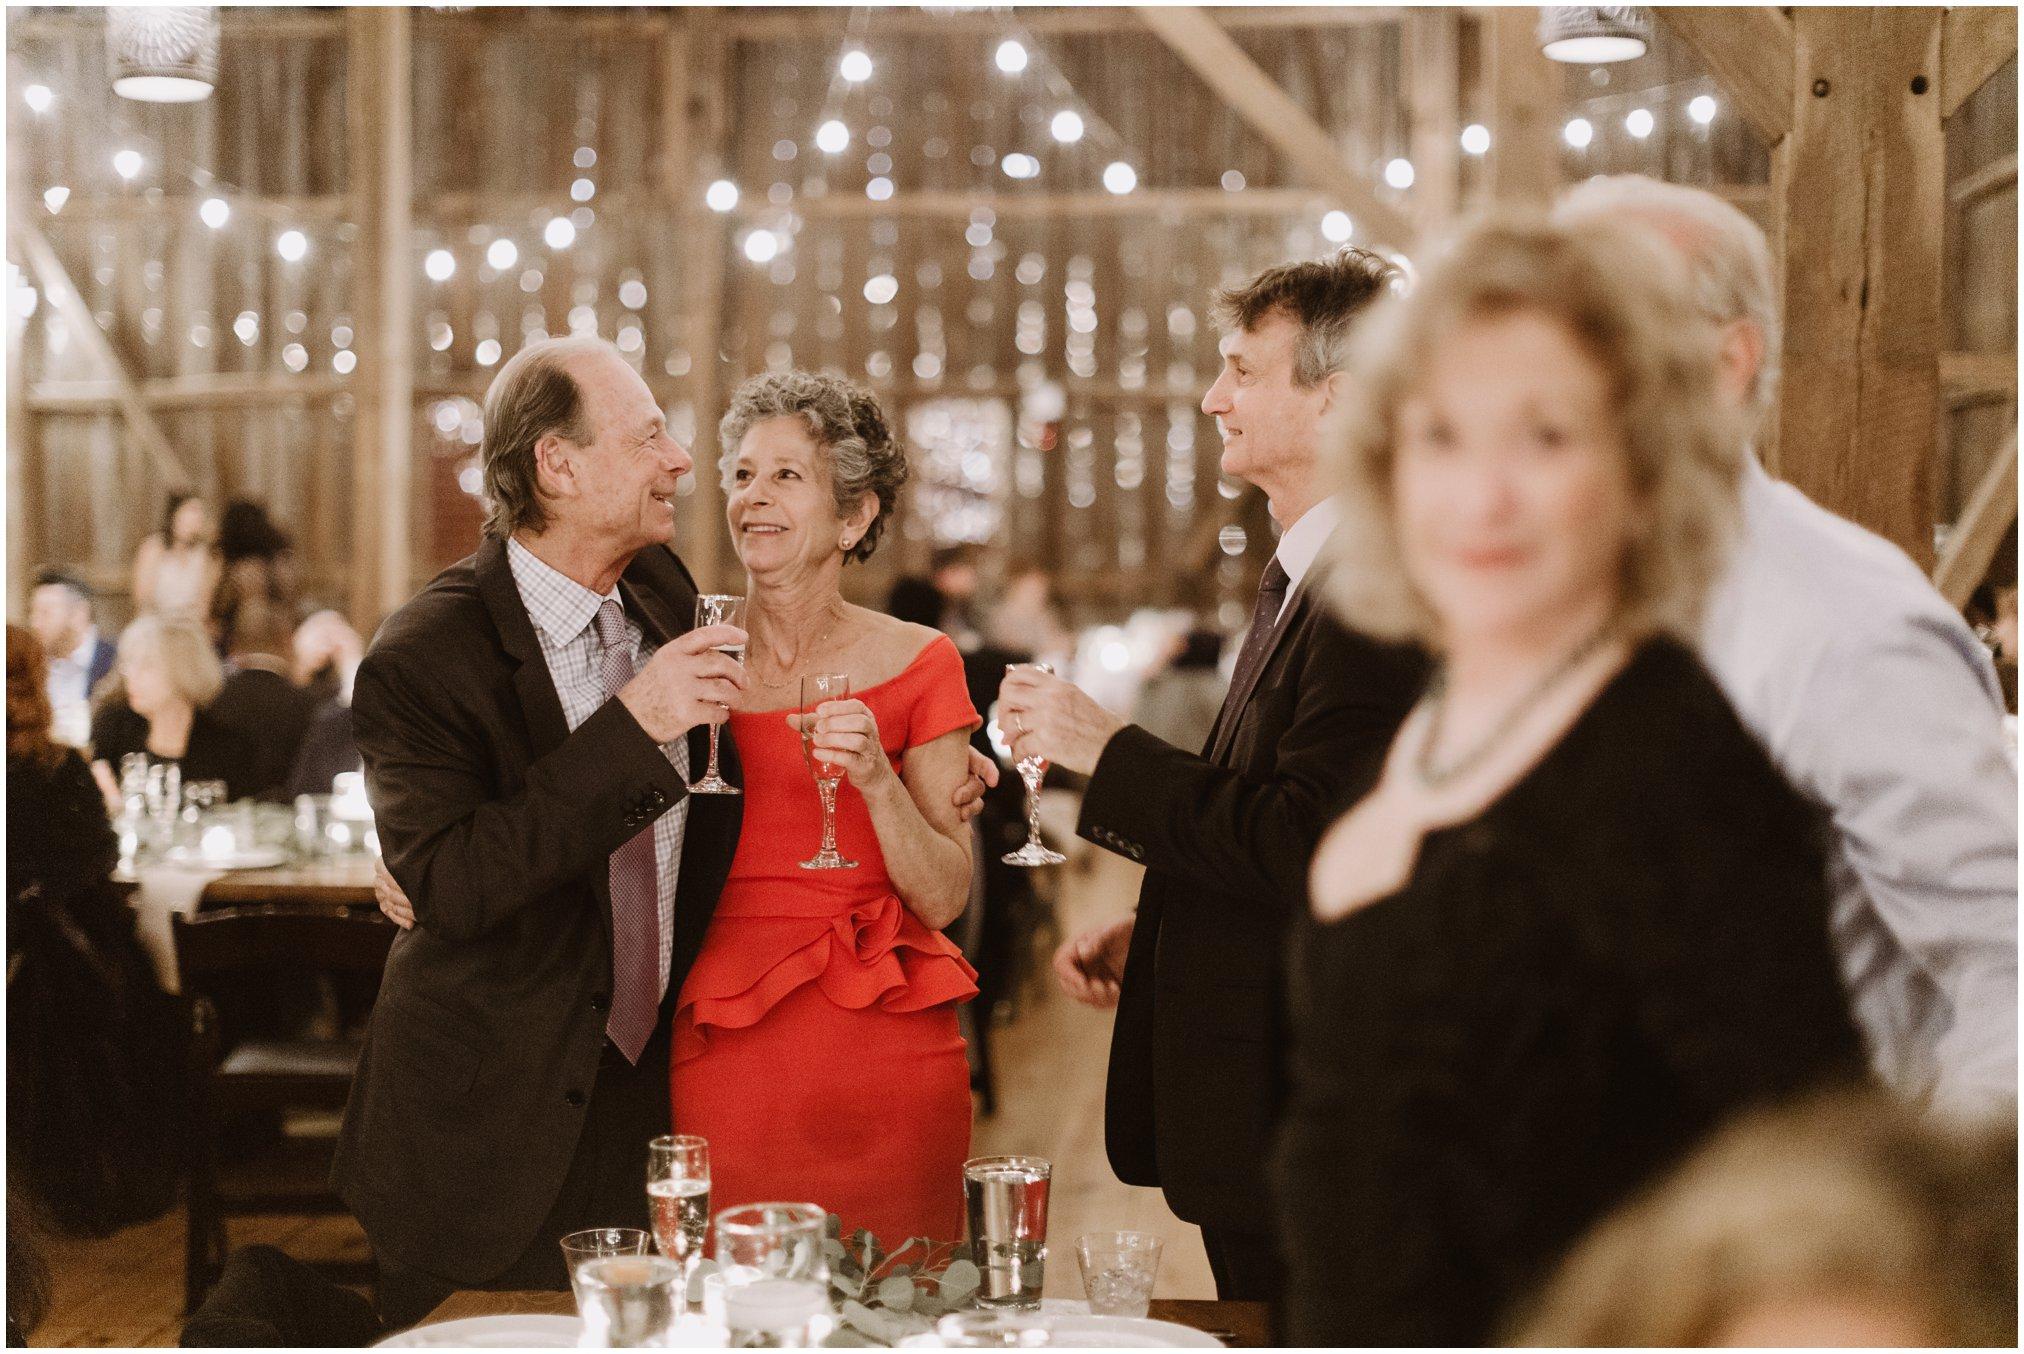 Riverside on the Potomac Wedding,Riverside on the Potomac Wedding reception, Riverside on the Potomac, Leesburg Wedding,  Virginia Wedding Photographer, Maryland Wedding Photographer, Fall Wedding, Kate Ann Photography